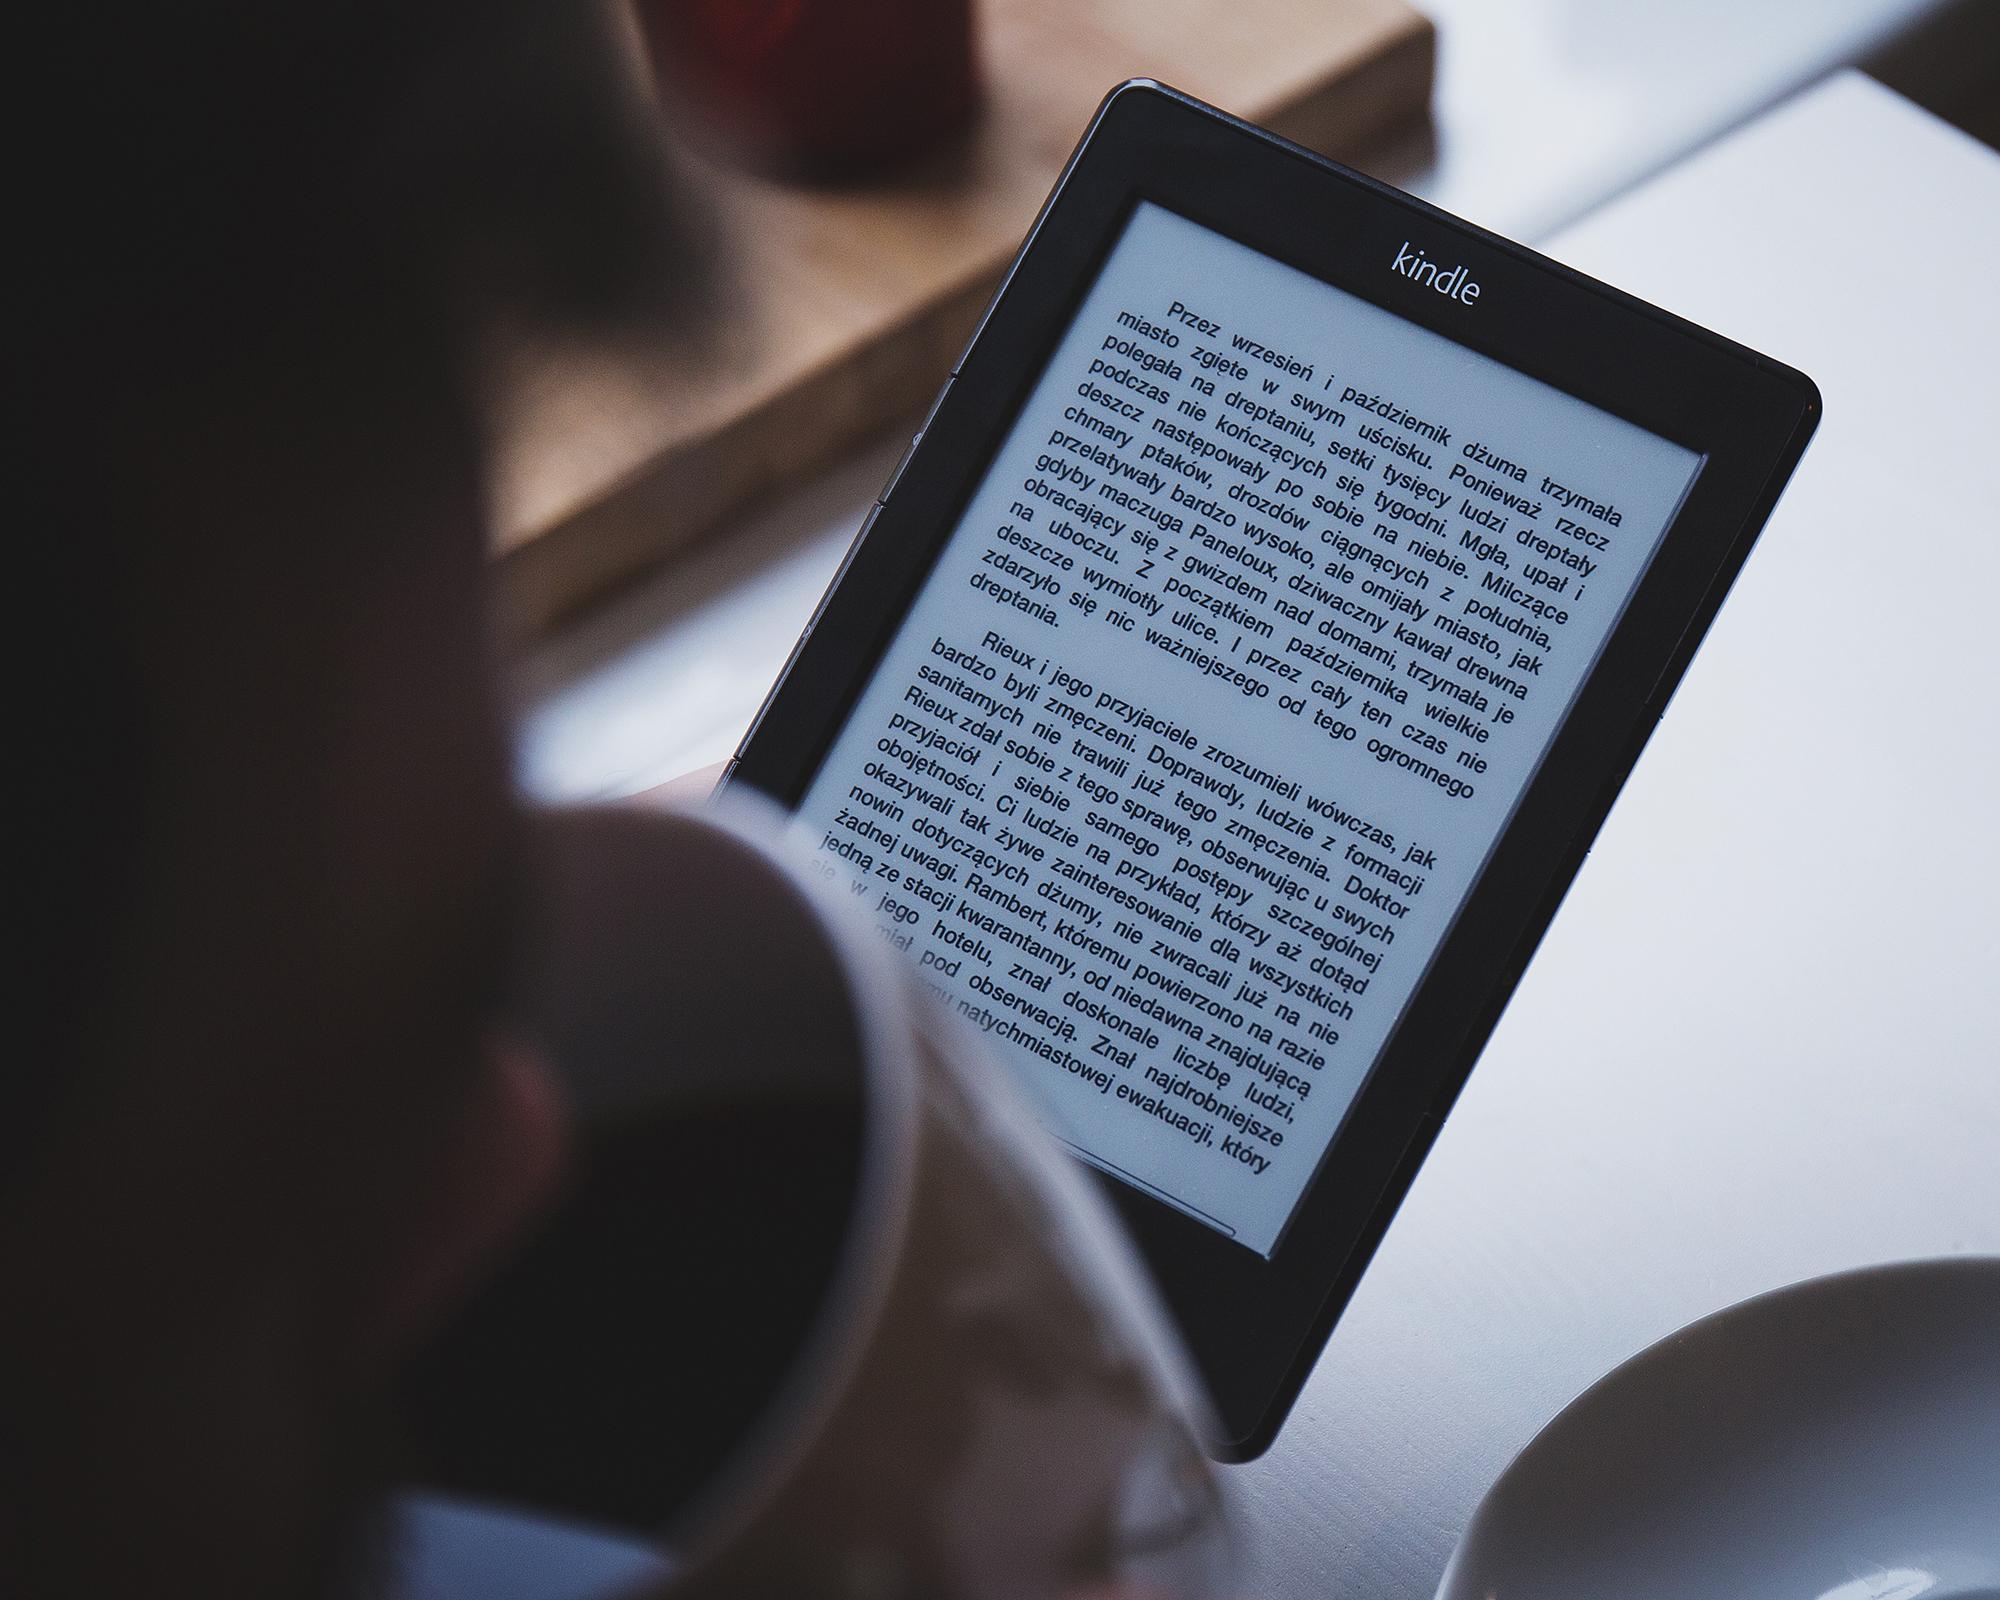 Which Digital Publishing Platform is Best? Part 1 – Amazon Kindle